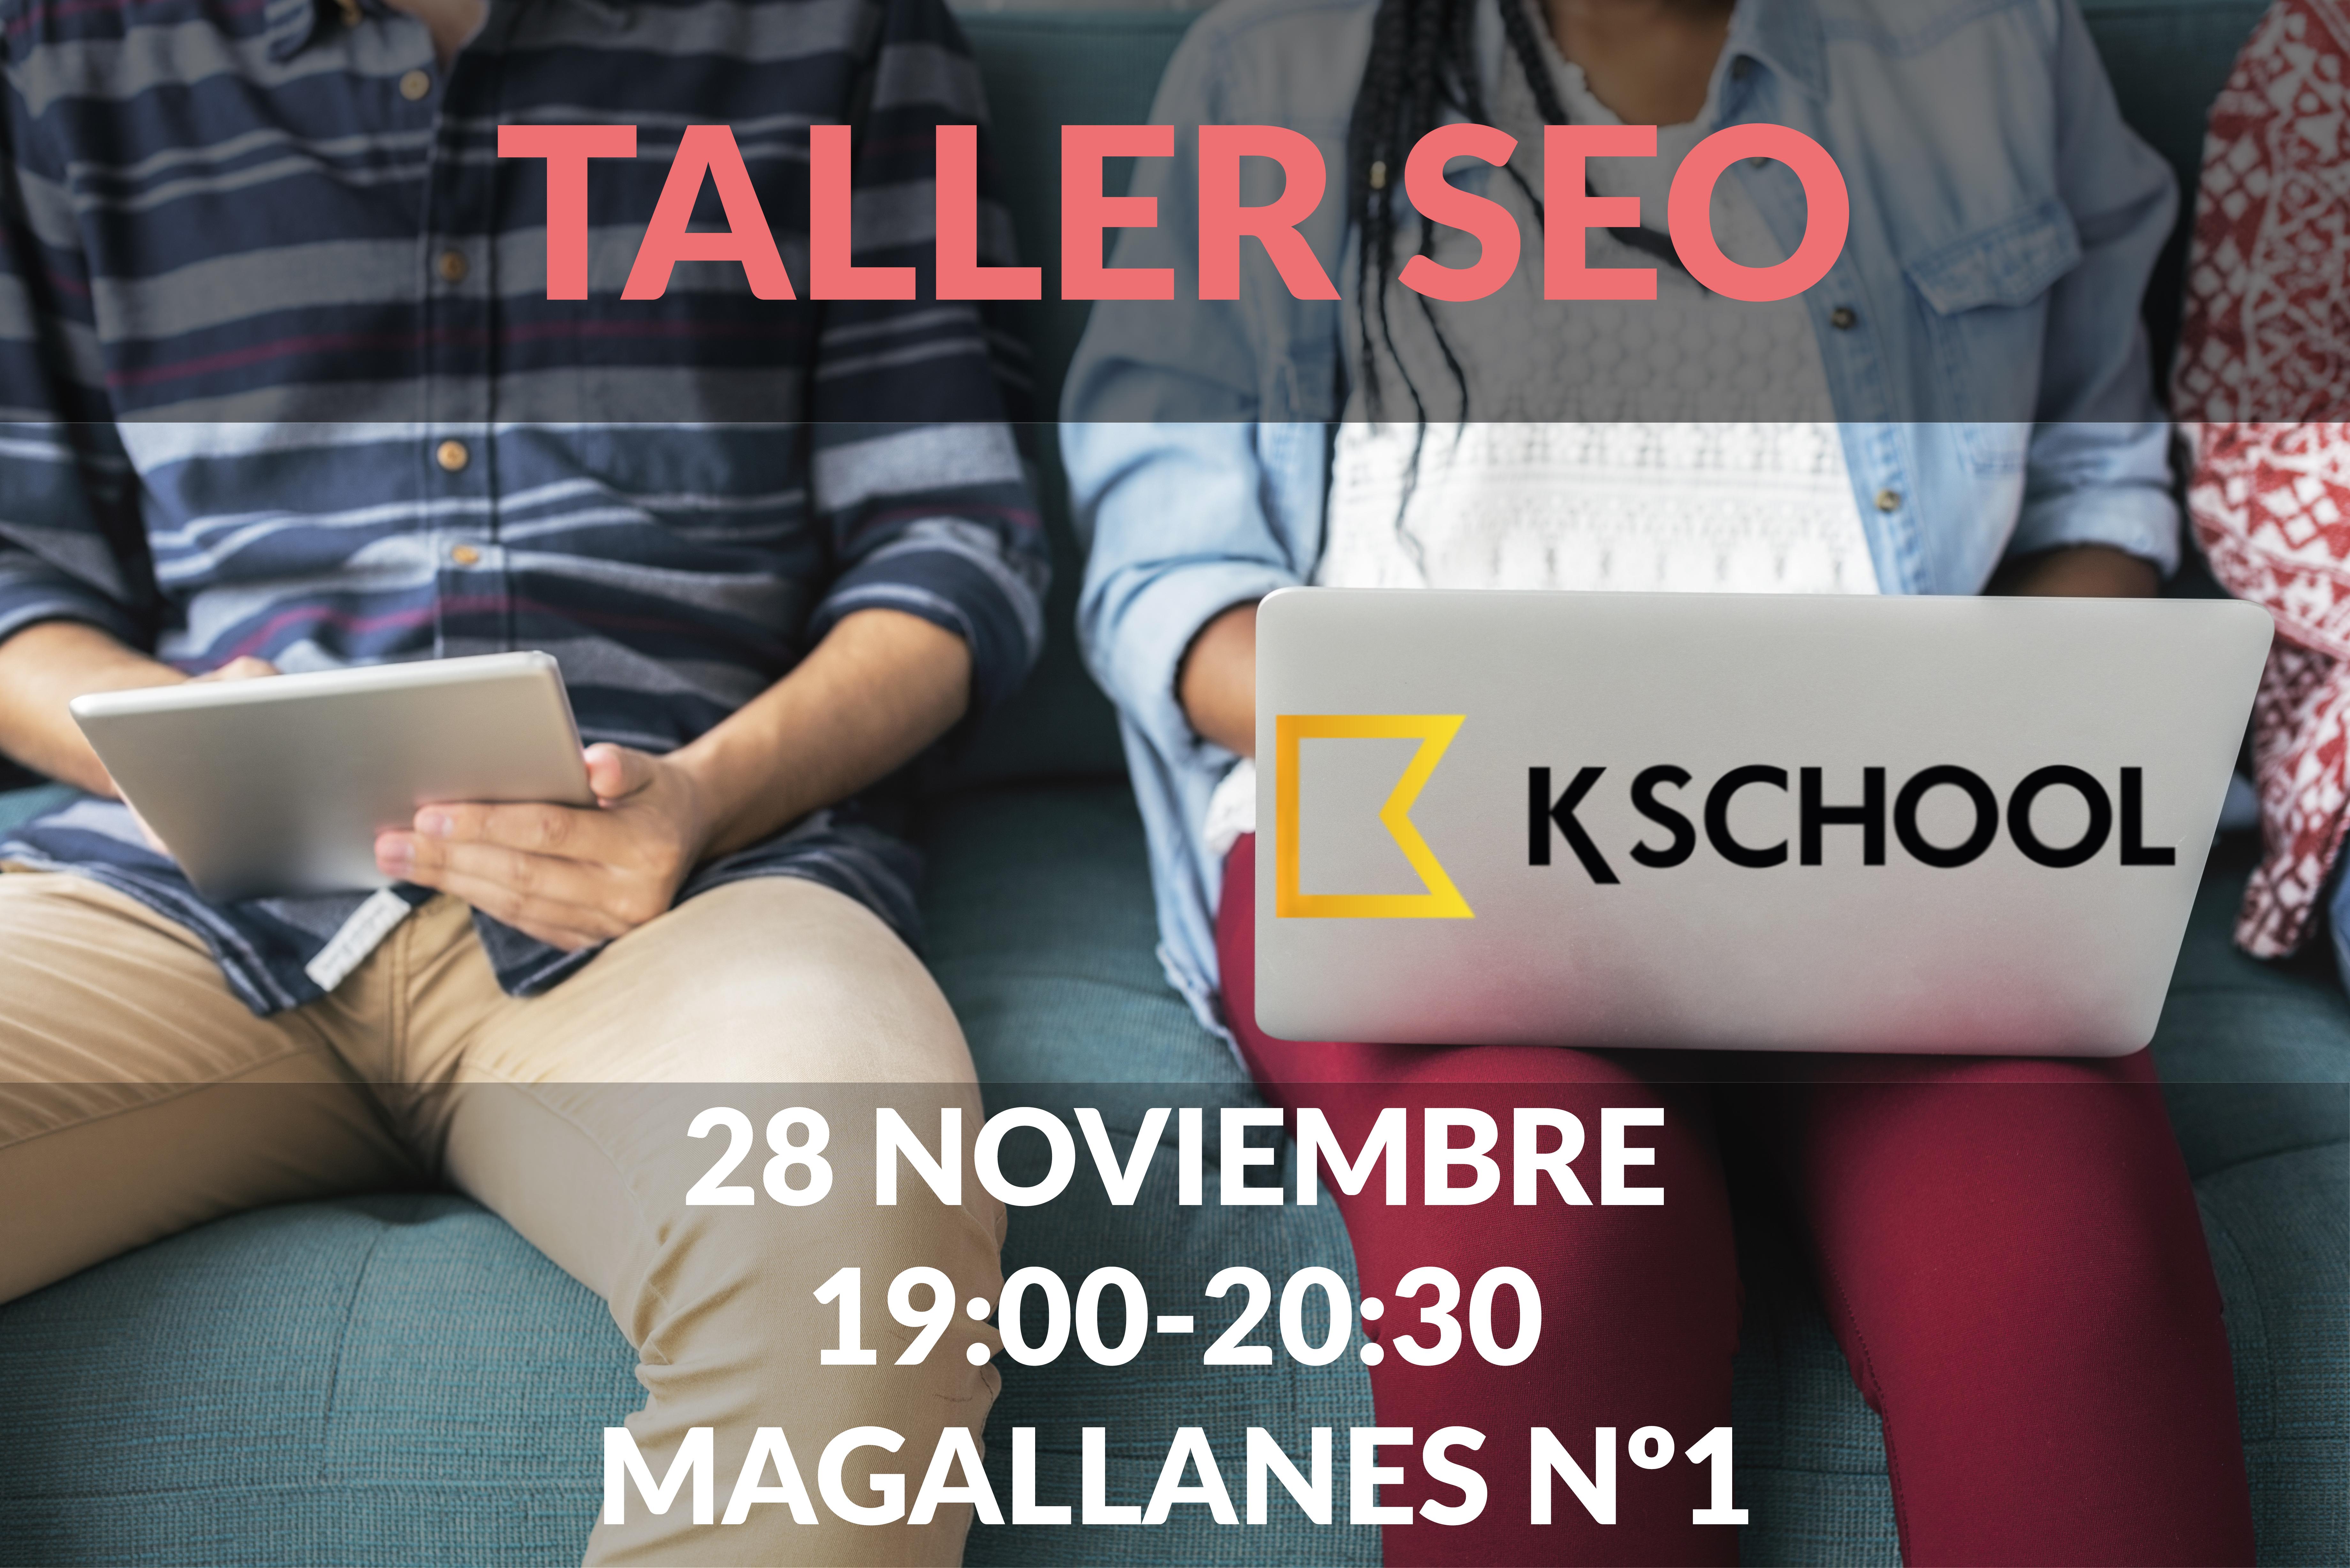 KSchool_TallerSEO